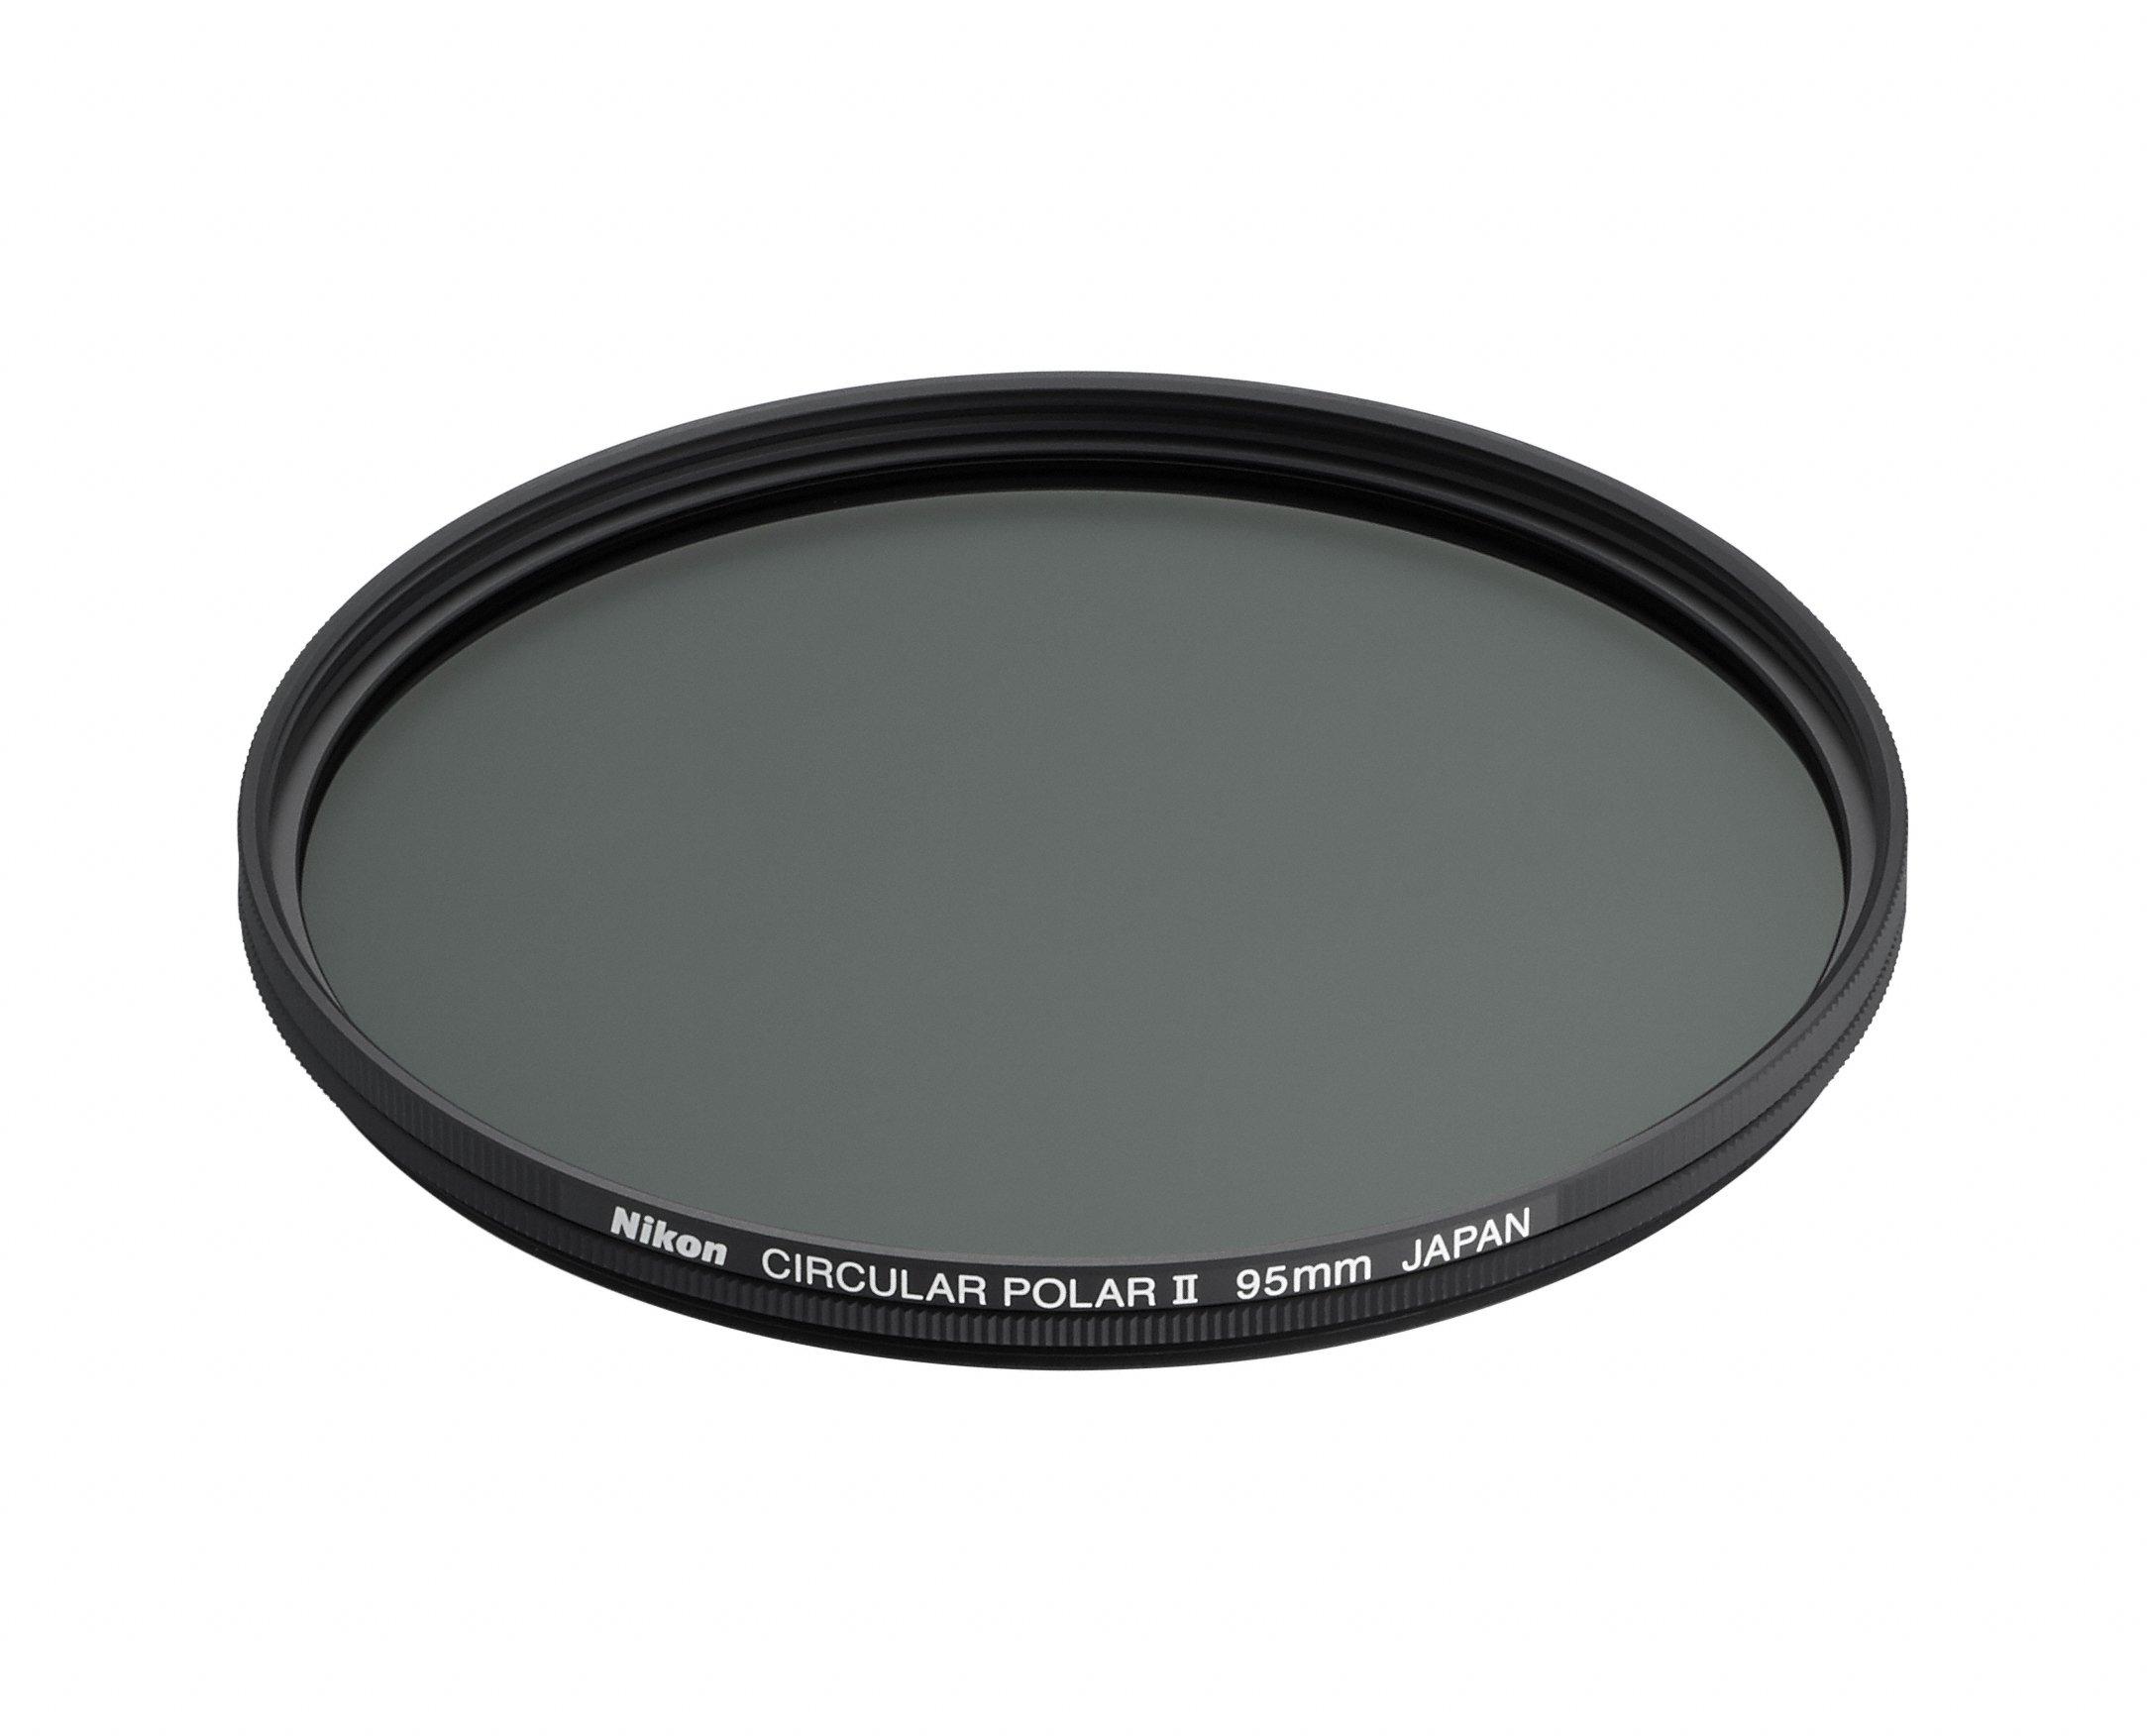 Nikon 95mm Circular Polarizing Filter II by Nikon